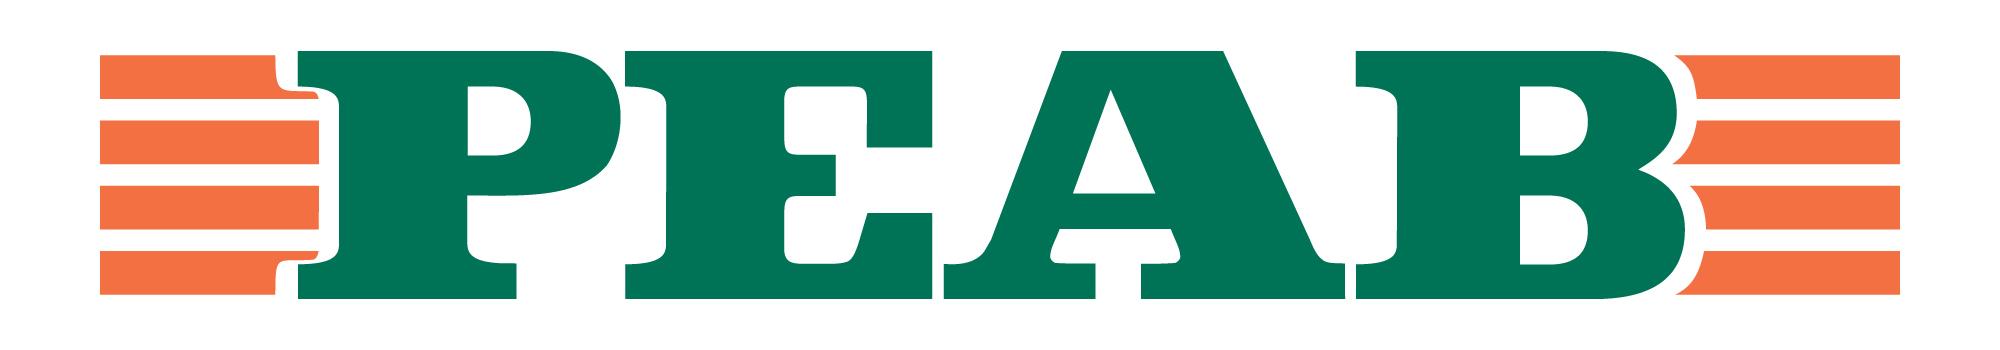 PEAB logo - kurssit Piuha IT -koulutus